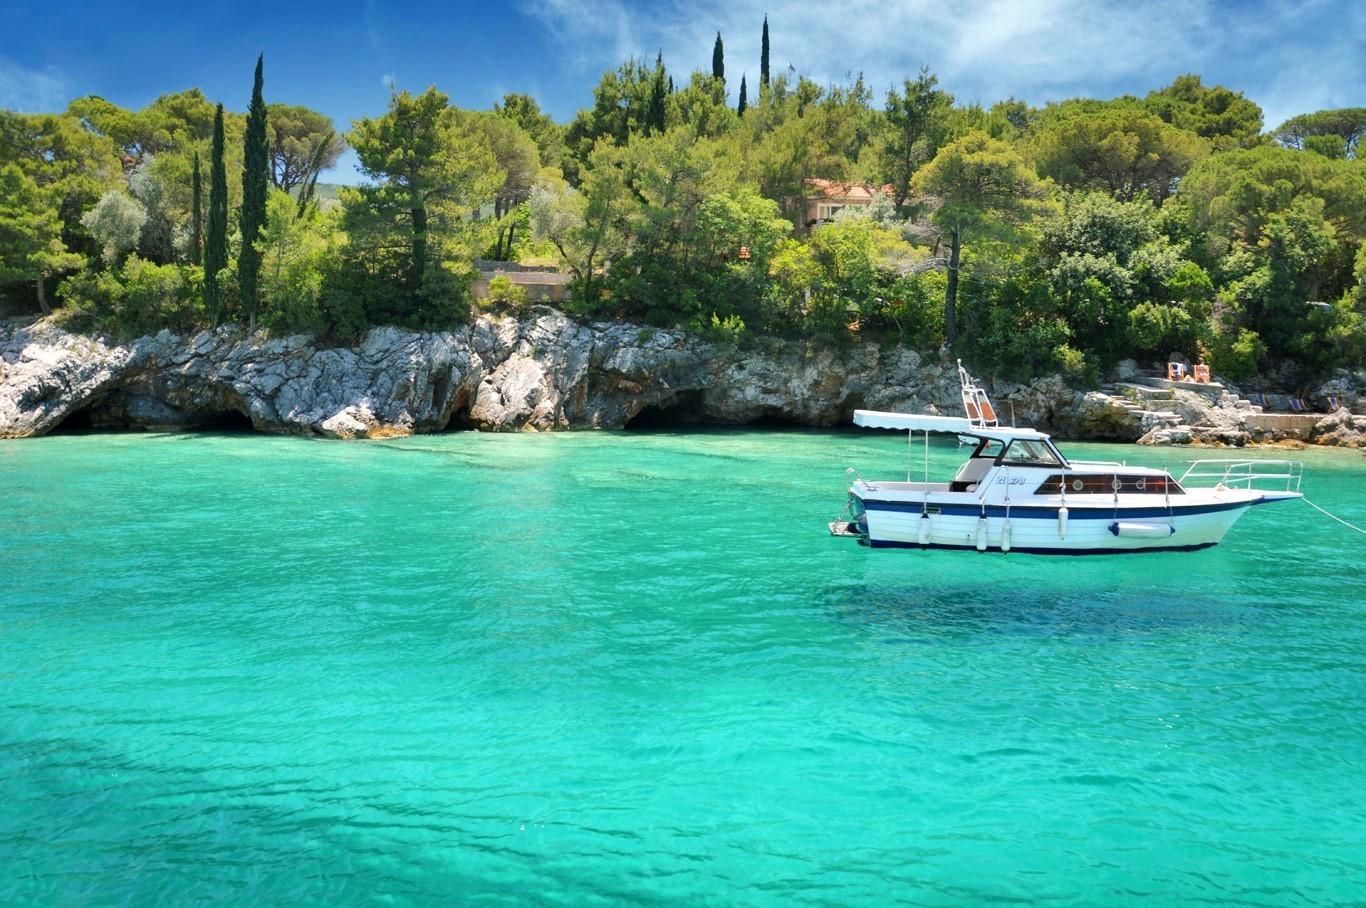 """Floating boat"" at Zanjic beach"